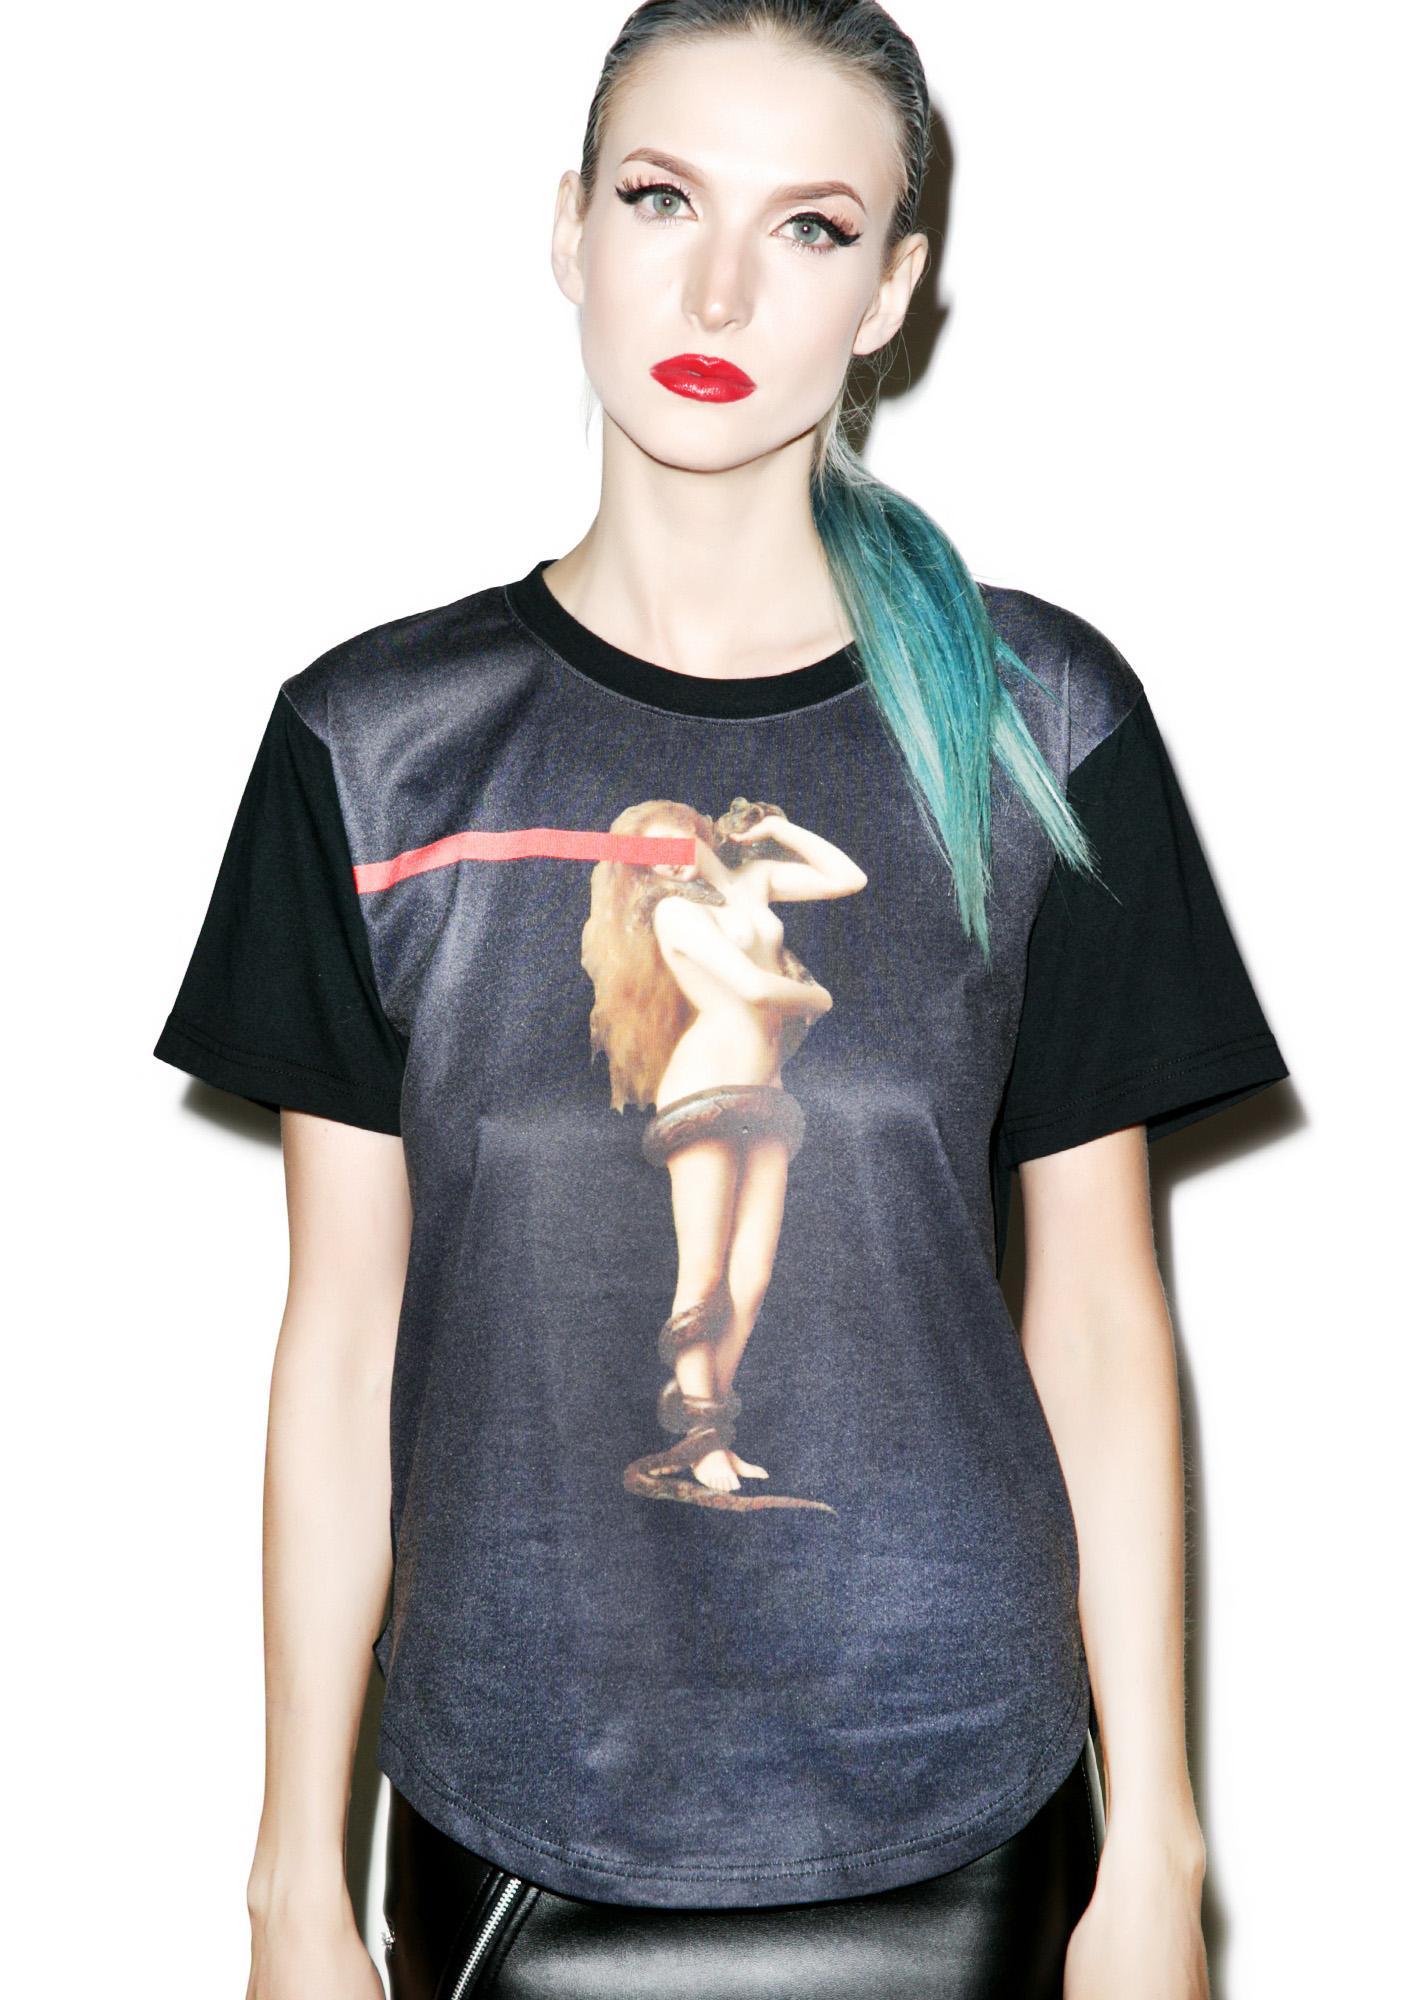 Black Scale Eve's Rib T-Shirt